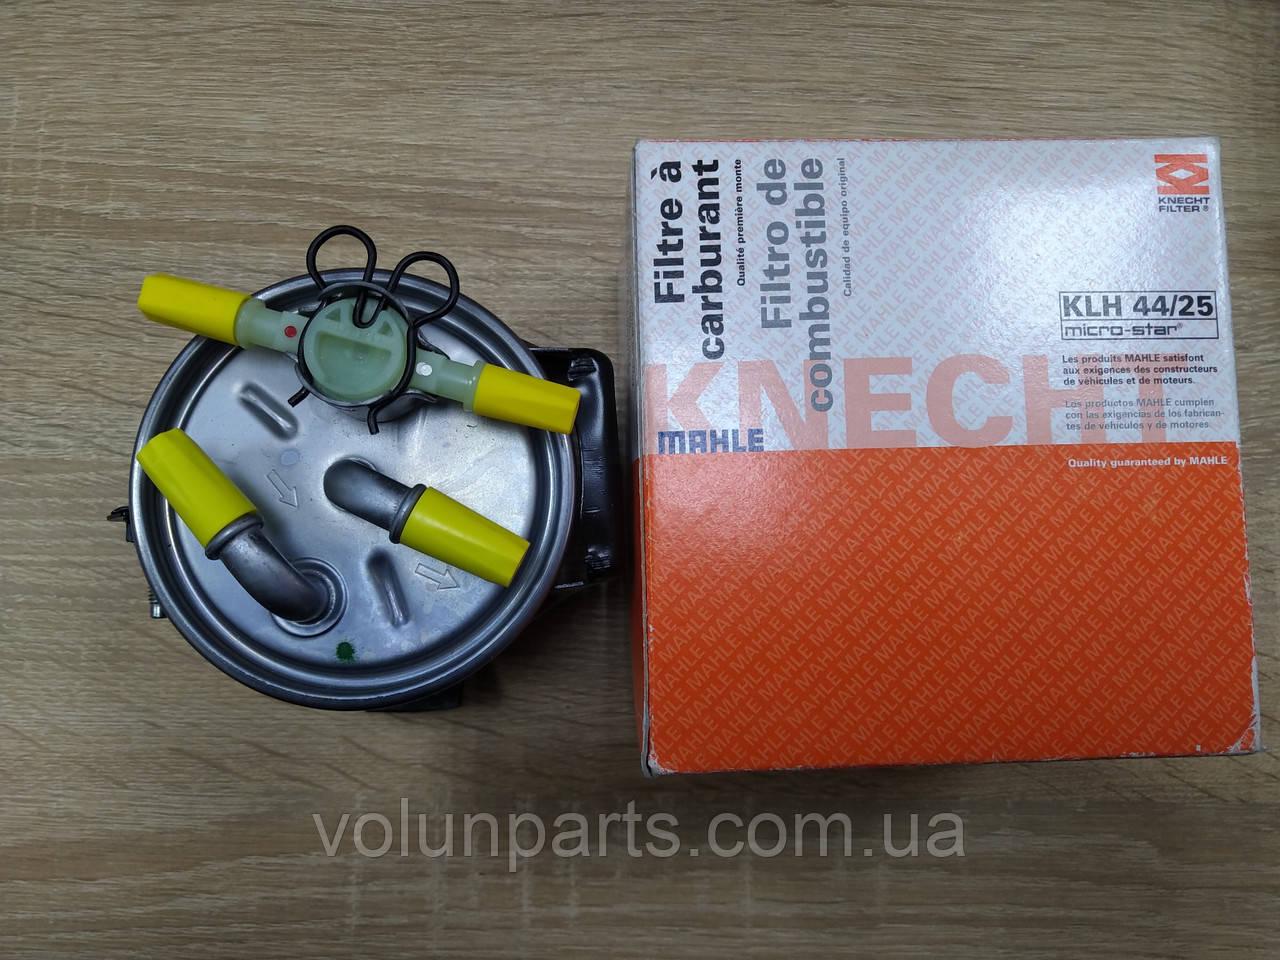 Паливни фільтр MEGANE 2 / SCENIC 2 / GRAND SCENIC 2 (KNECHT/MAHLE KLH 44/25) під датчік води